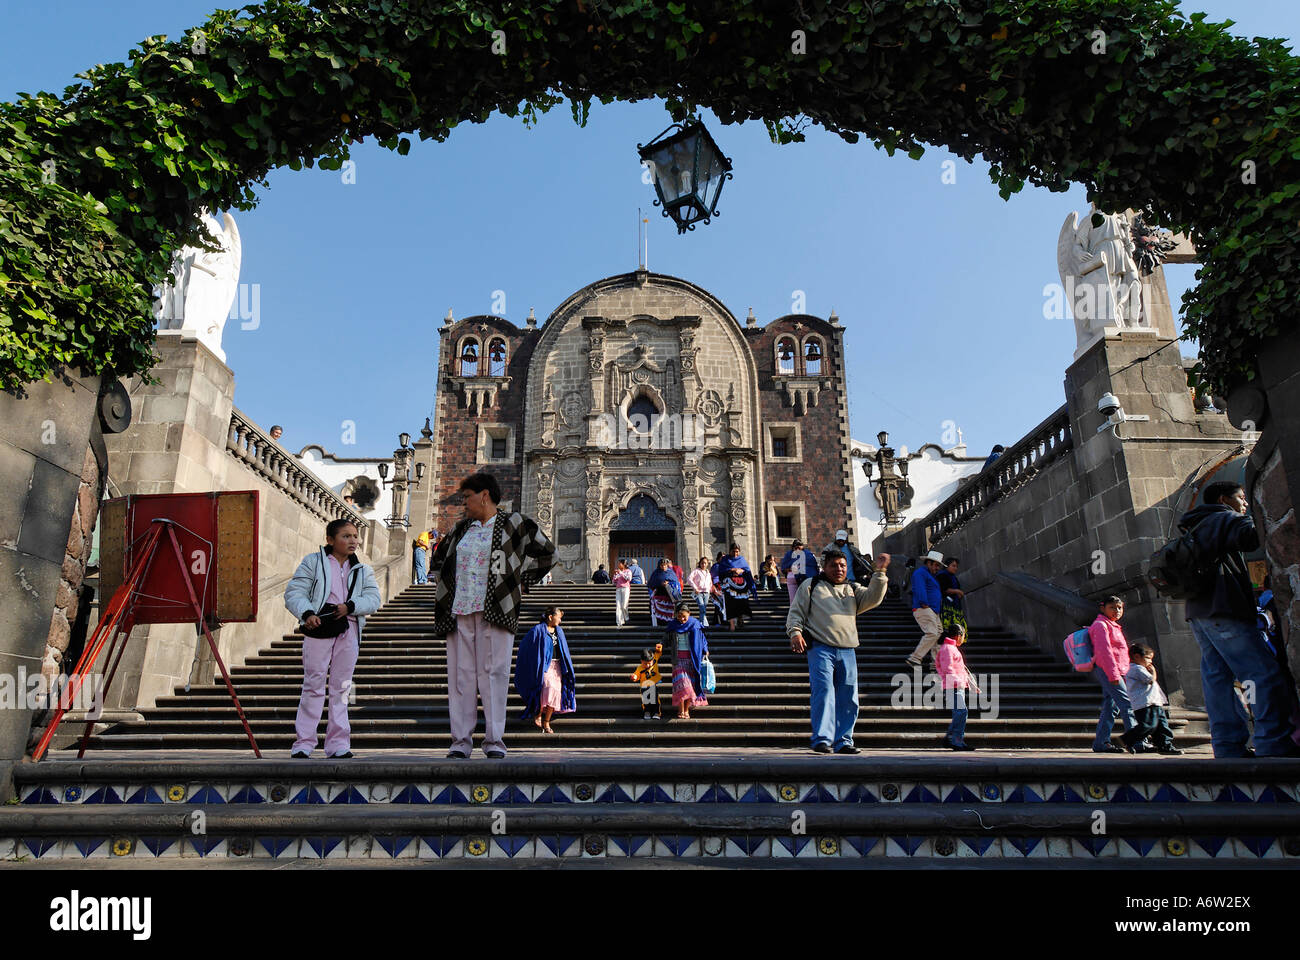 Mexican Pilgrim Stock Photos & Mexican Pilgrim Stock Images - Alamy